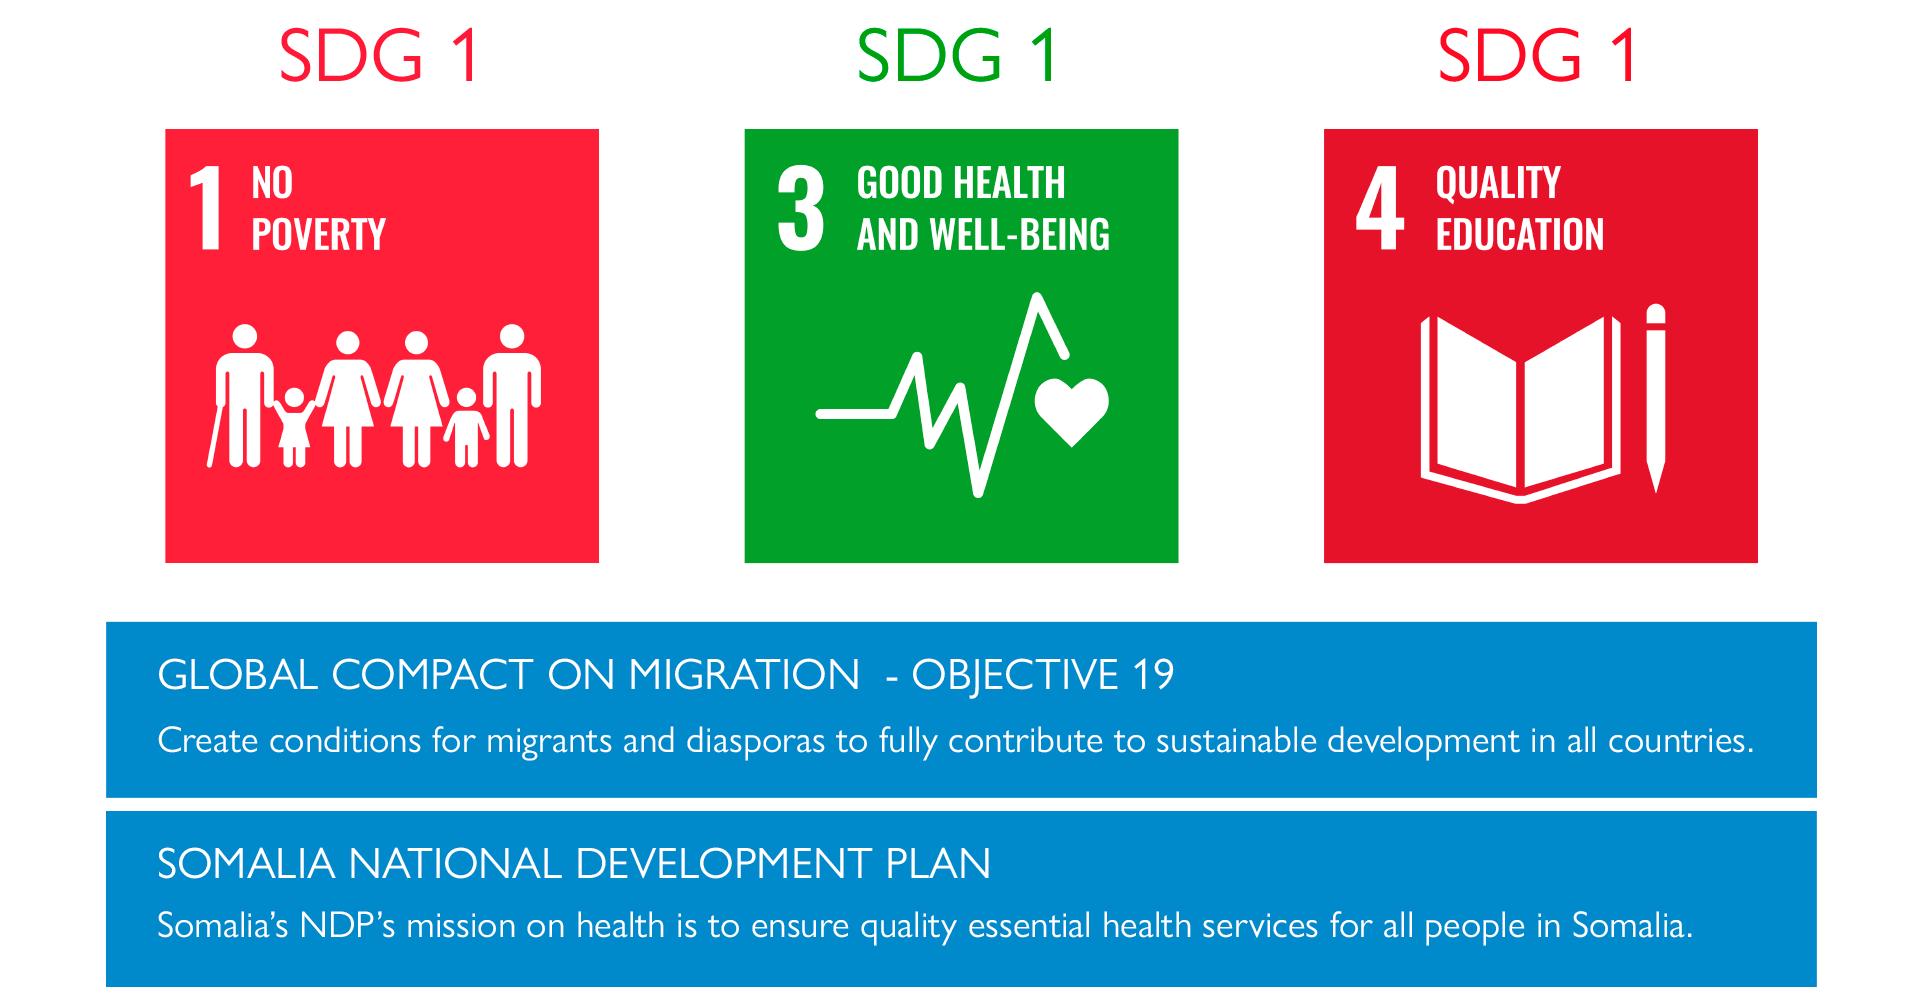 SDGs, Global Compact Migration